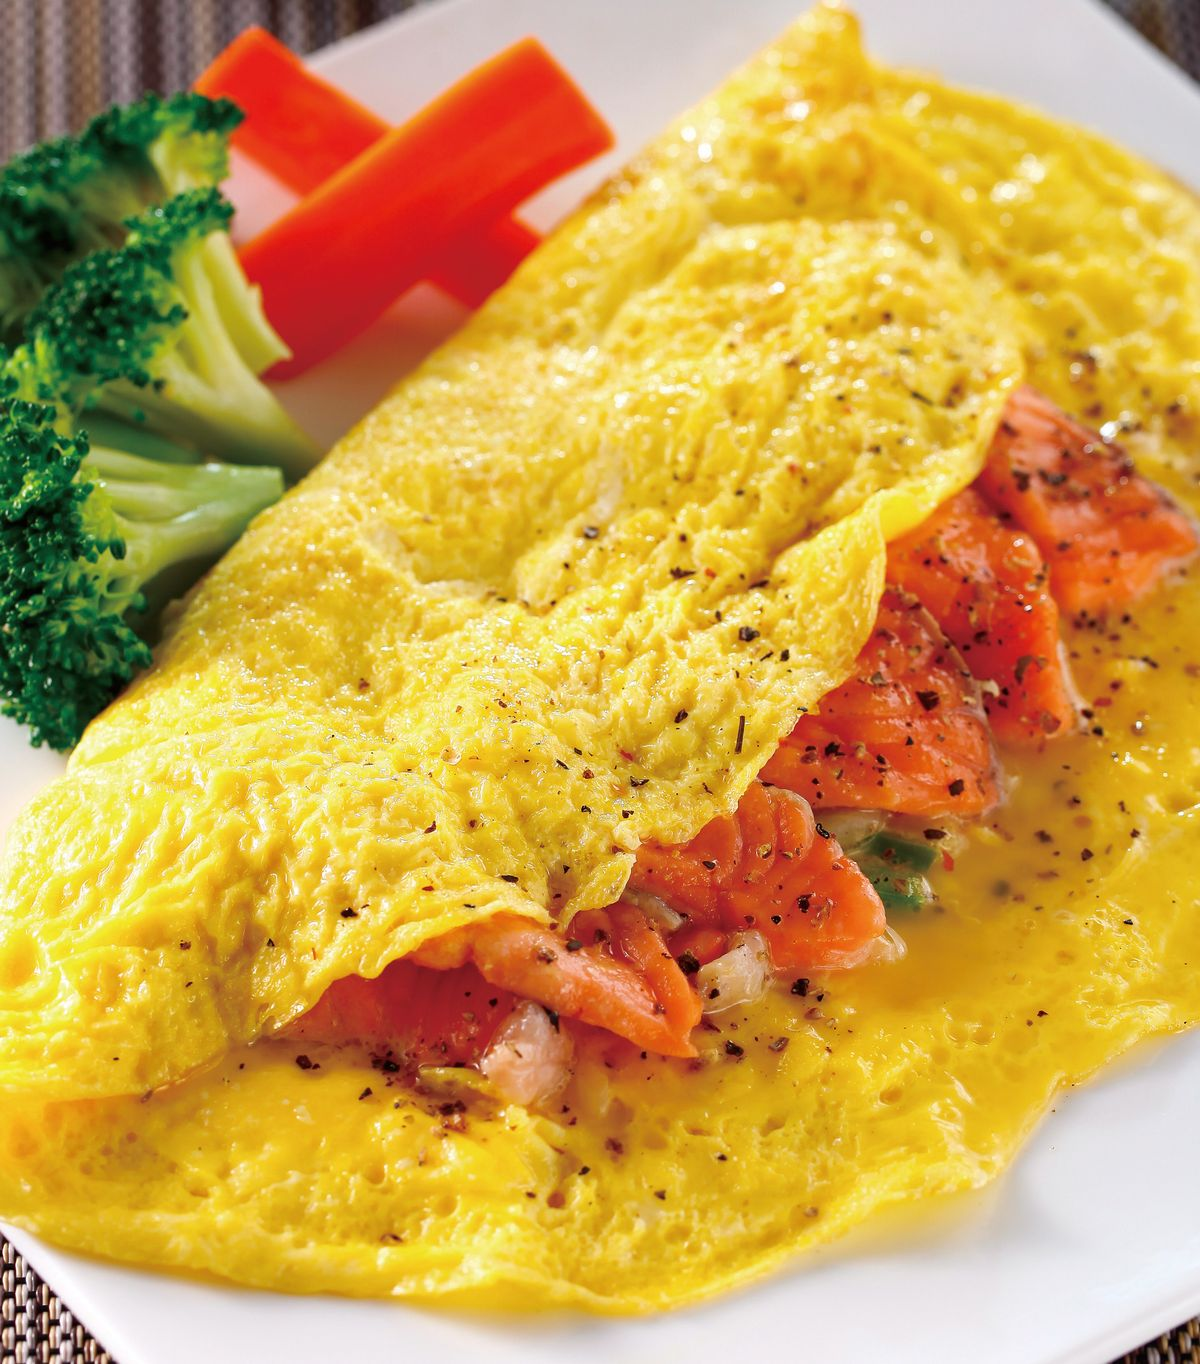 食譜:洋蔥鮭魚蛋捲